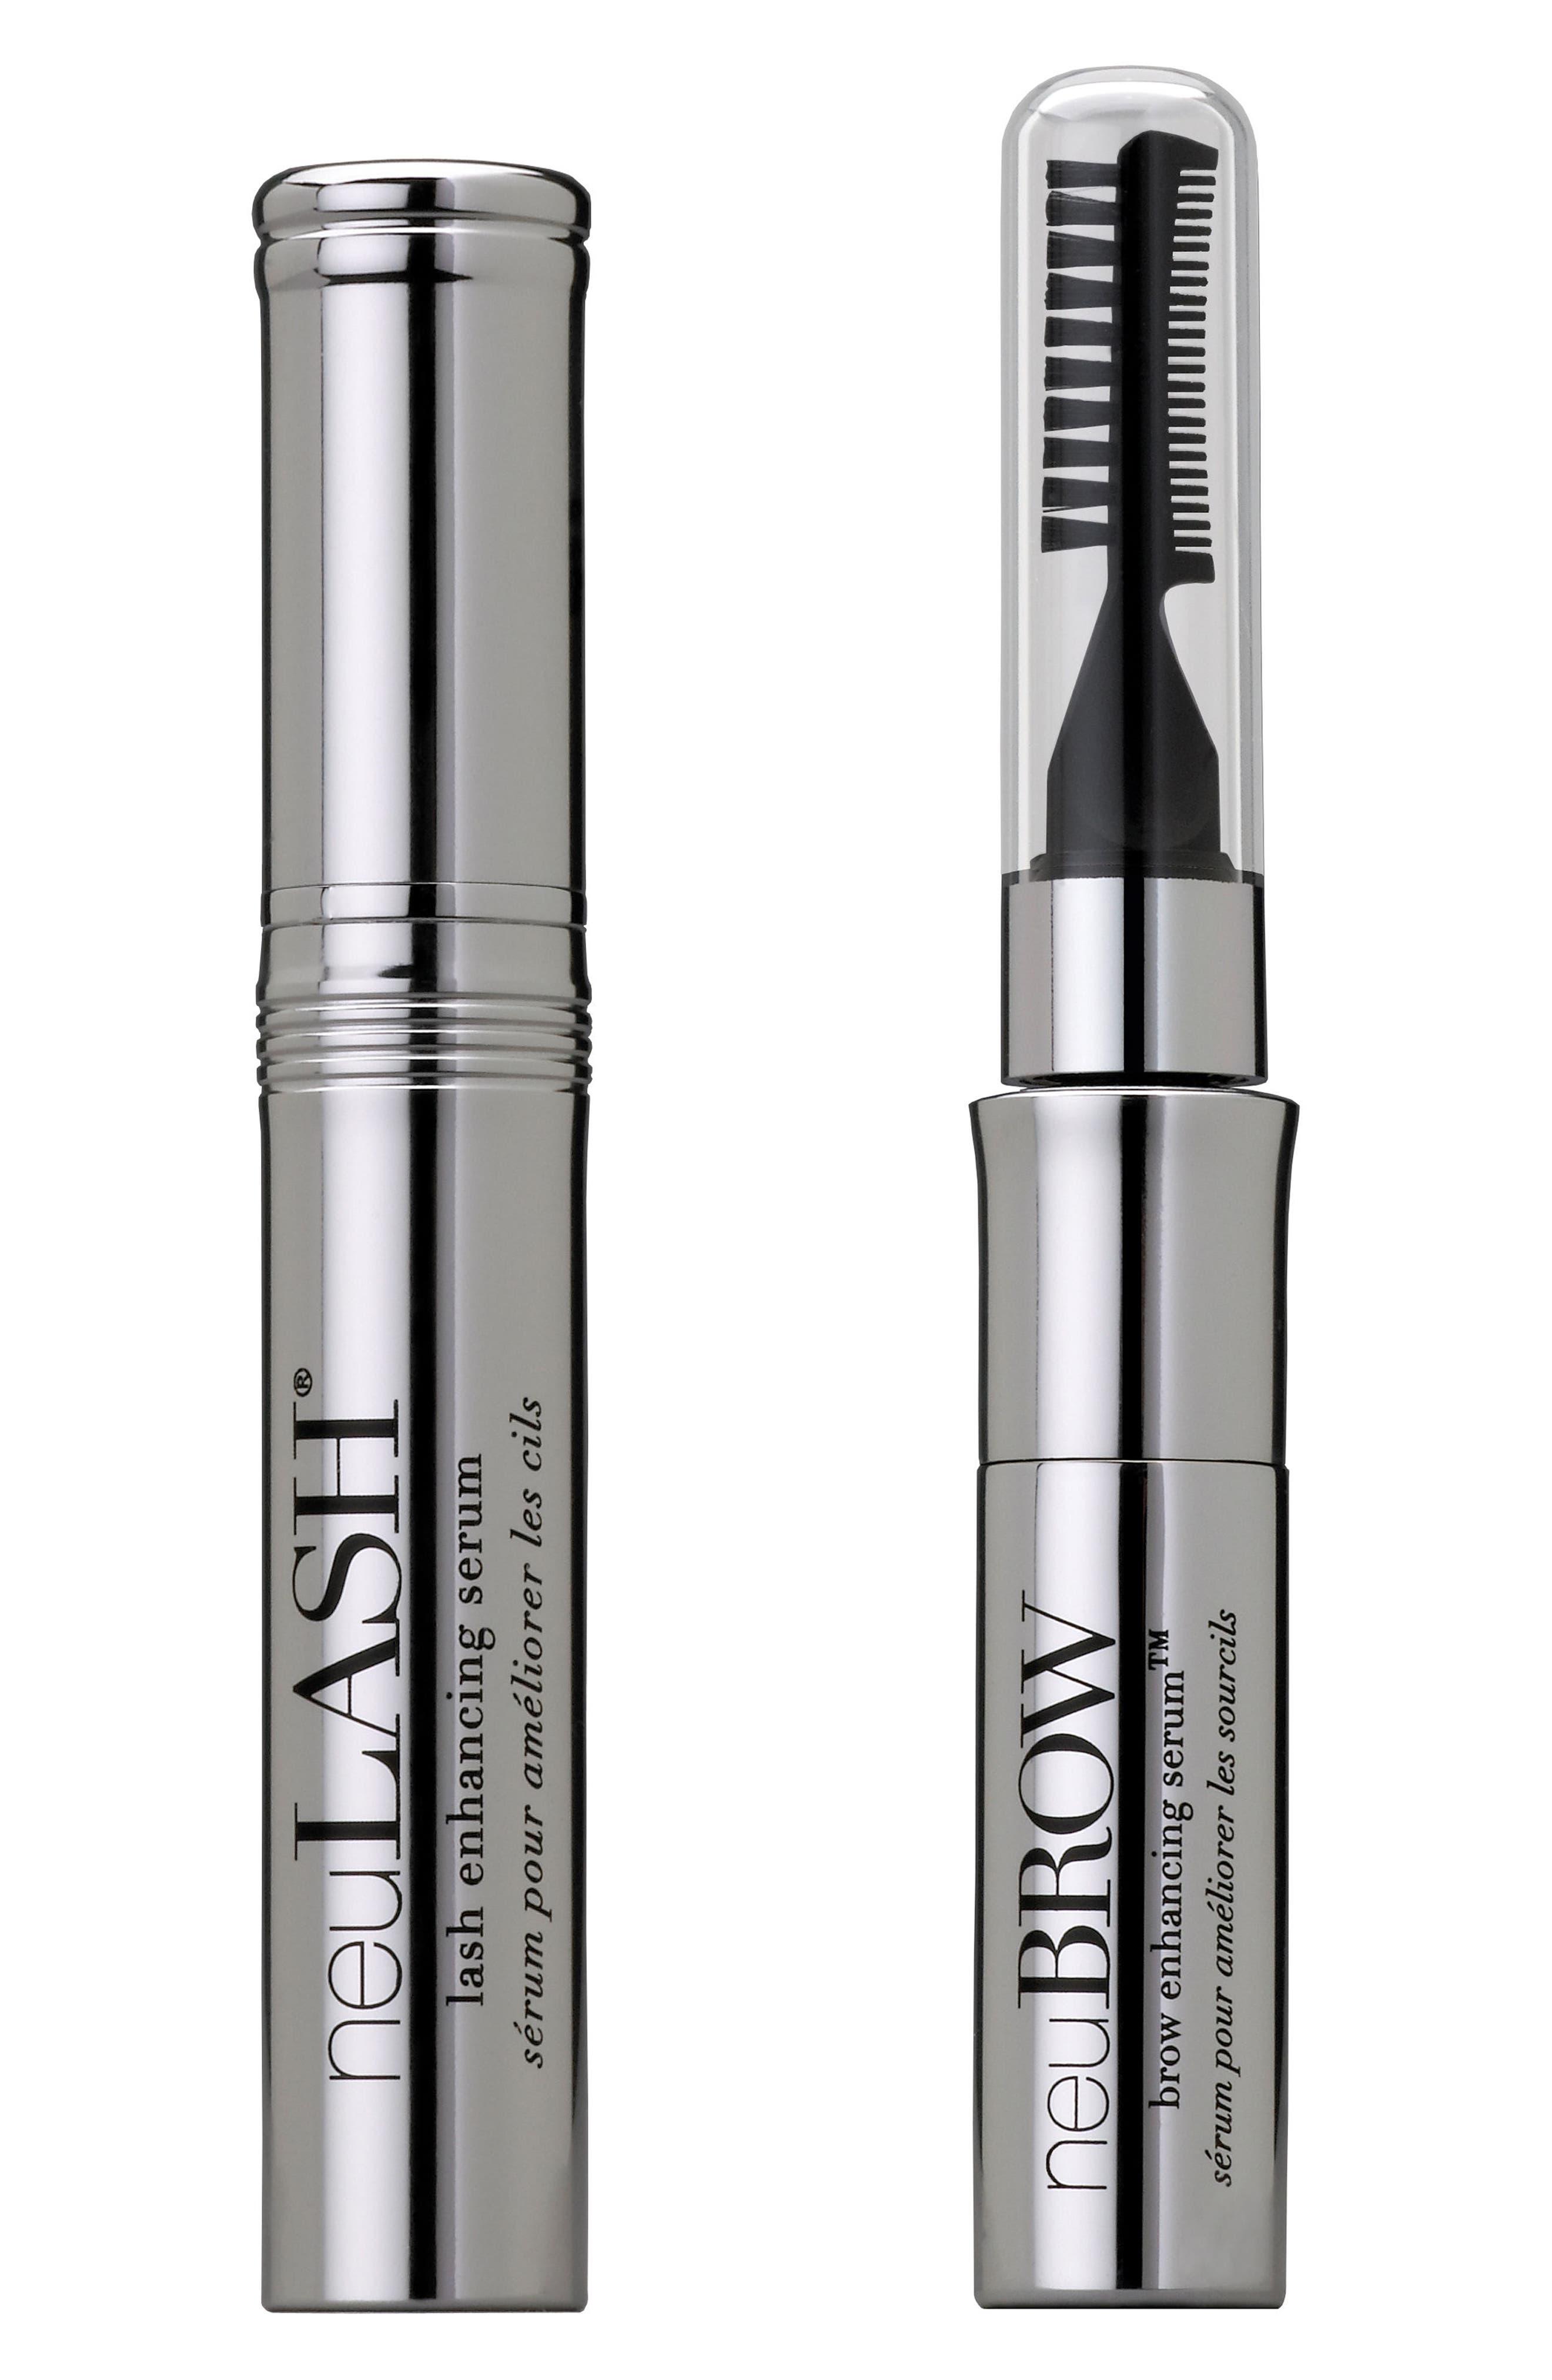 Main Image - neuLASH® Lash & Brow Enhancing Serum Duo ($250 Value)